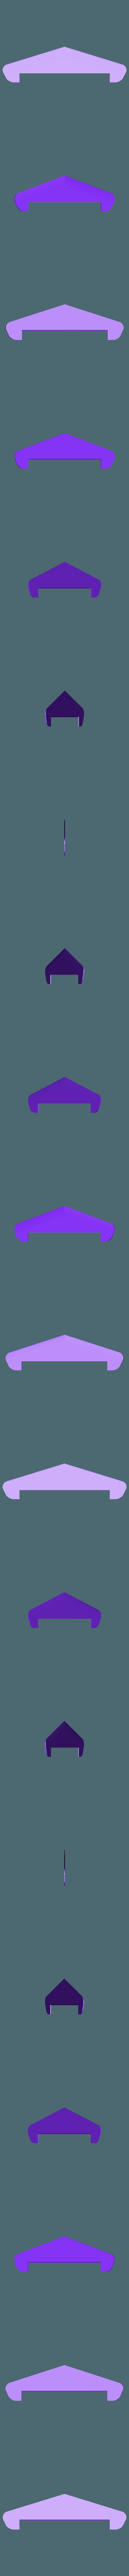 Horizontal Stabilizer 1 Rev01.STL Download free STL file V1 Release - New RC Plane • 3D printable design, Trikonics